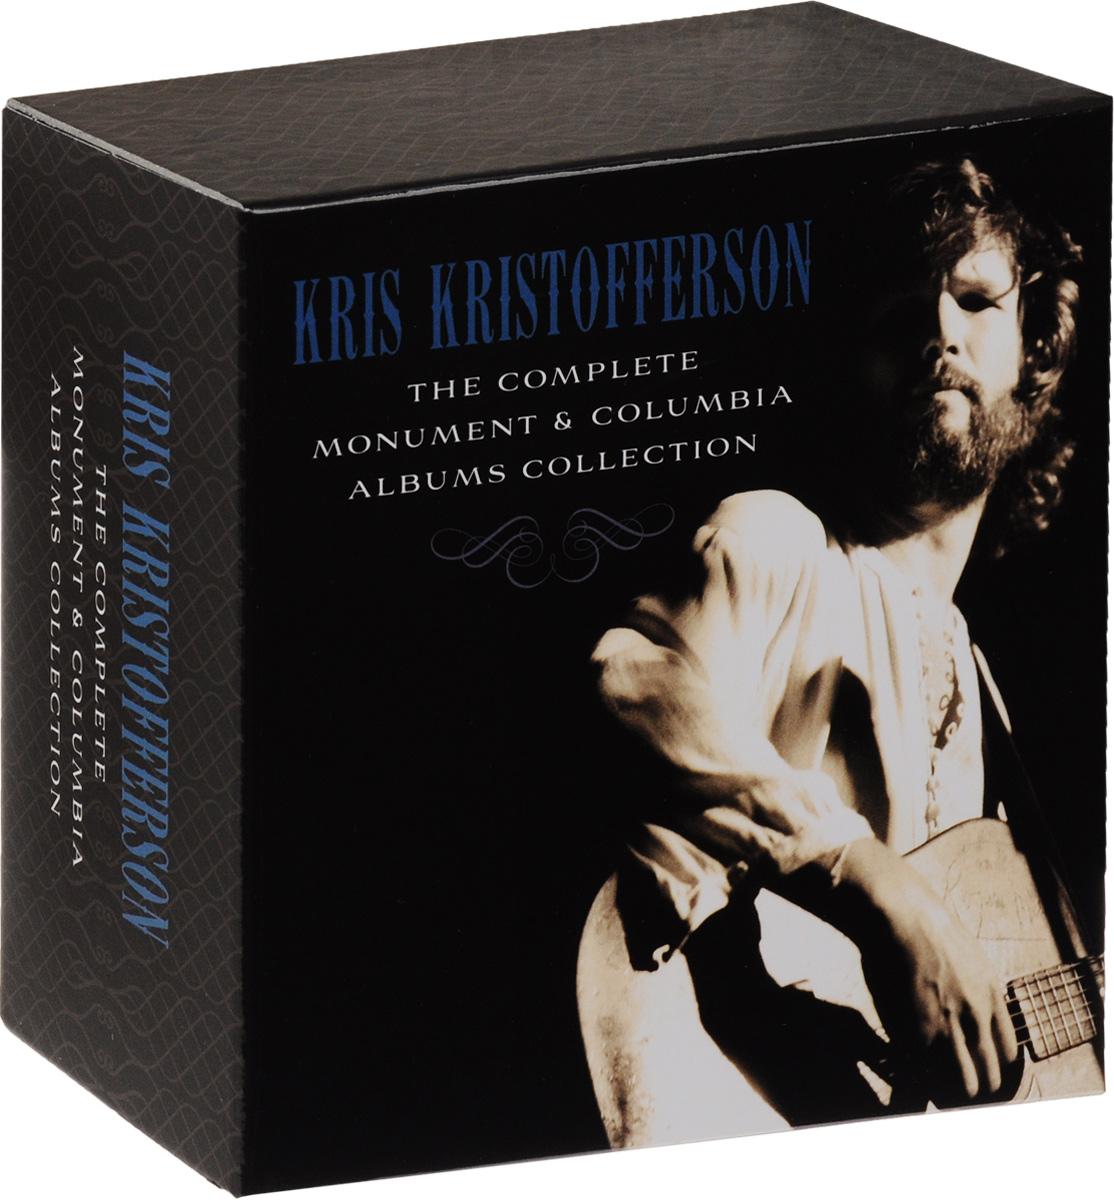 лучшая цена Крис Кристофферсон Kris Kristofferson. The Complete Monument & Columbia Albums Collection (16 CD)